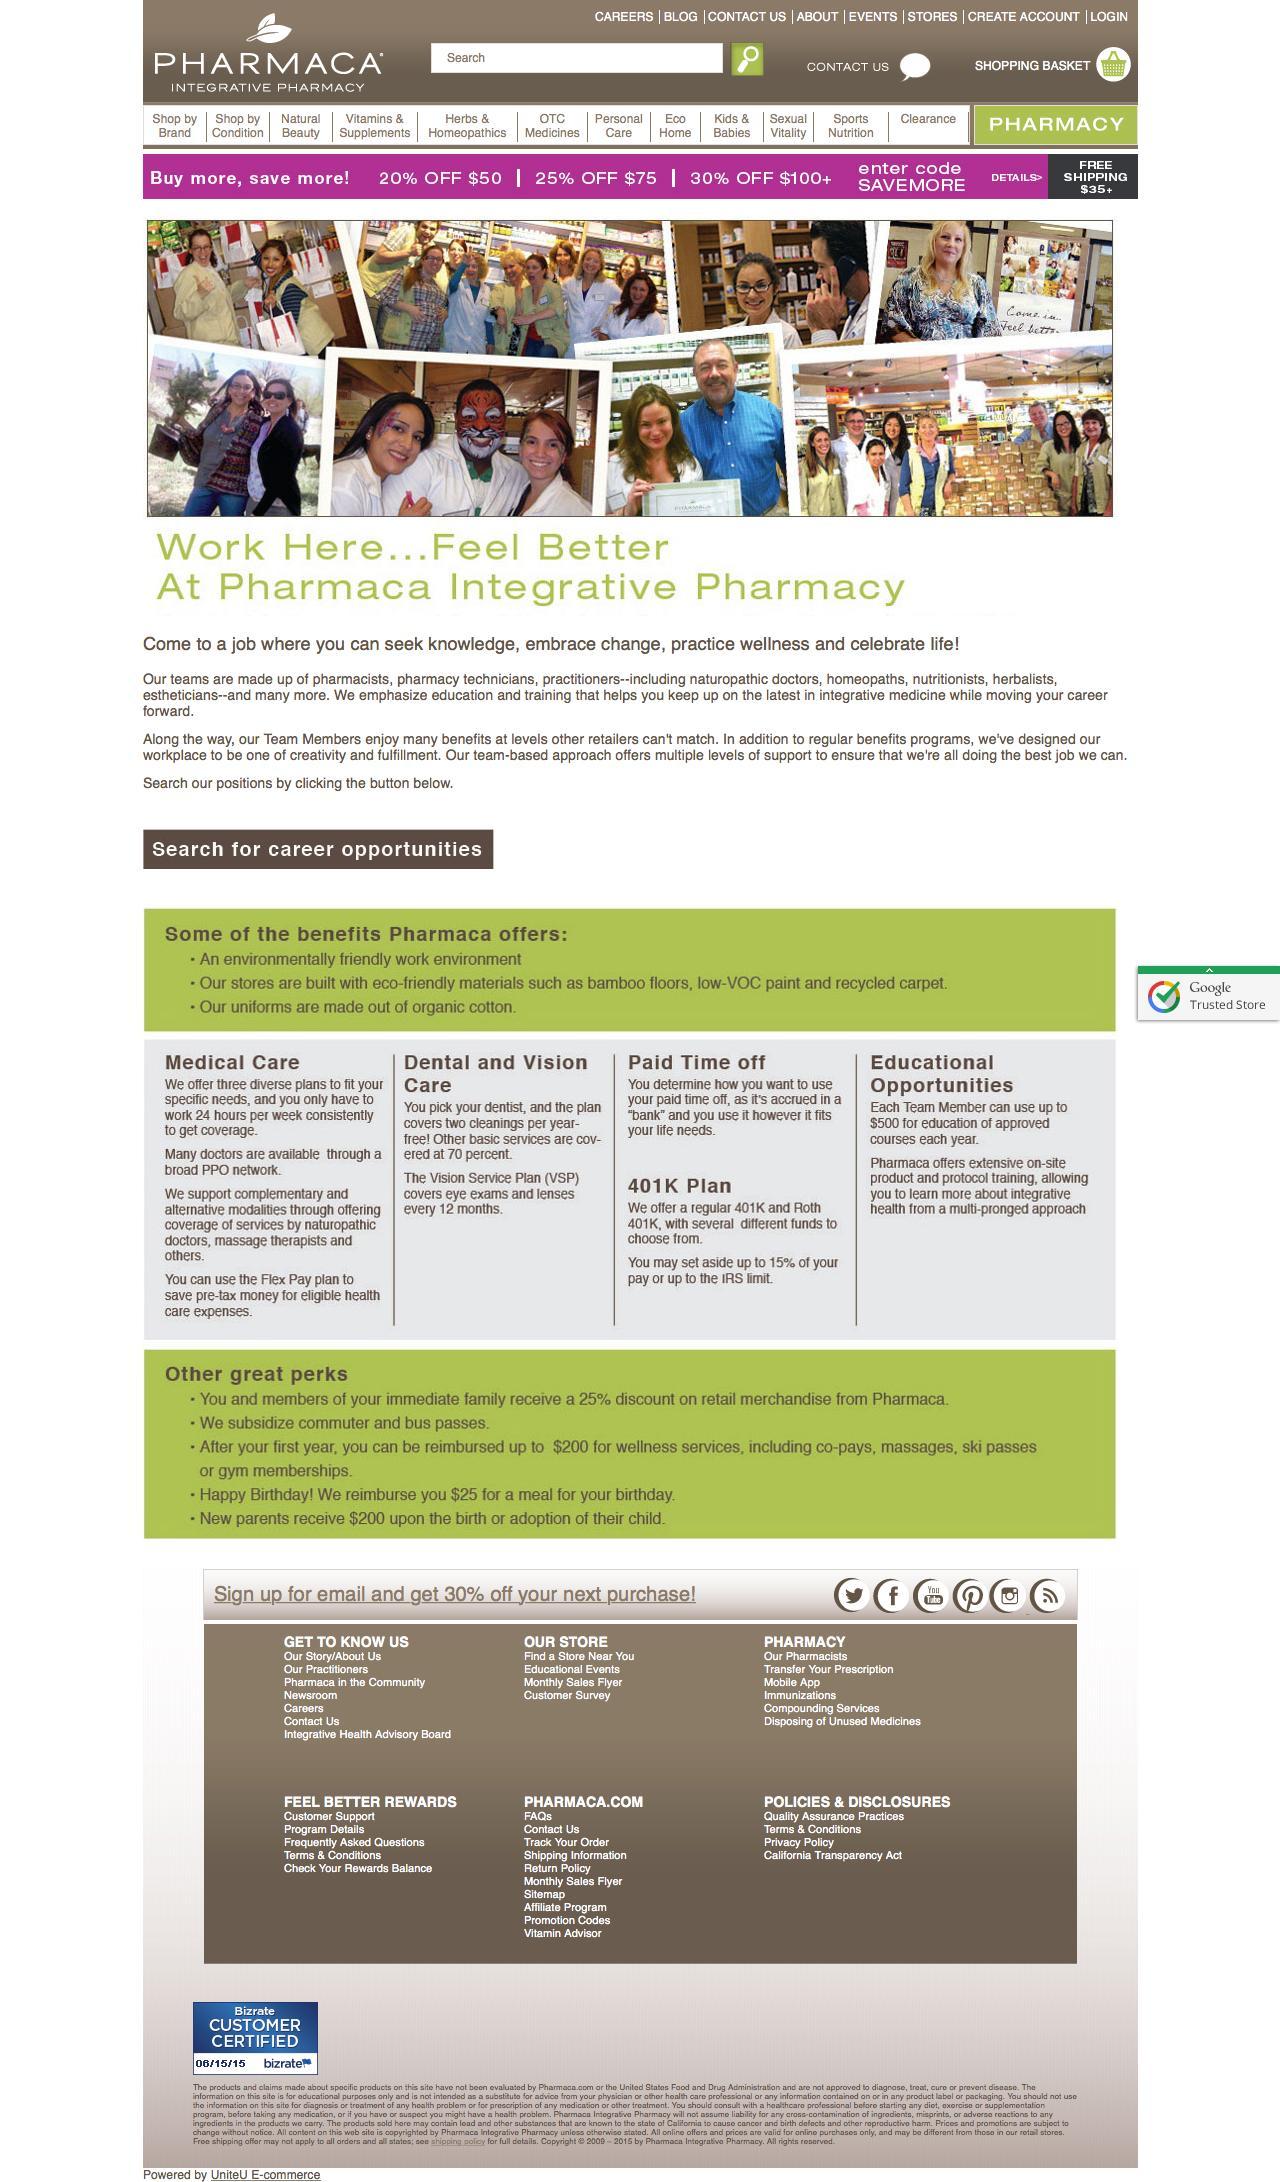 Screenshot of pharmaca.com - Work here, feel better at Pharmaca Integrative Pharmacy - captured June 16, 2015